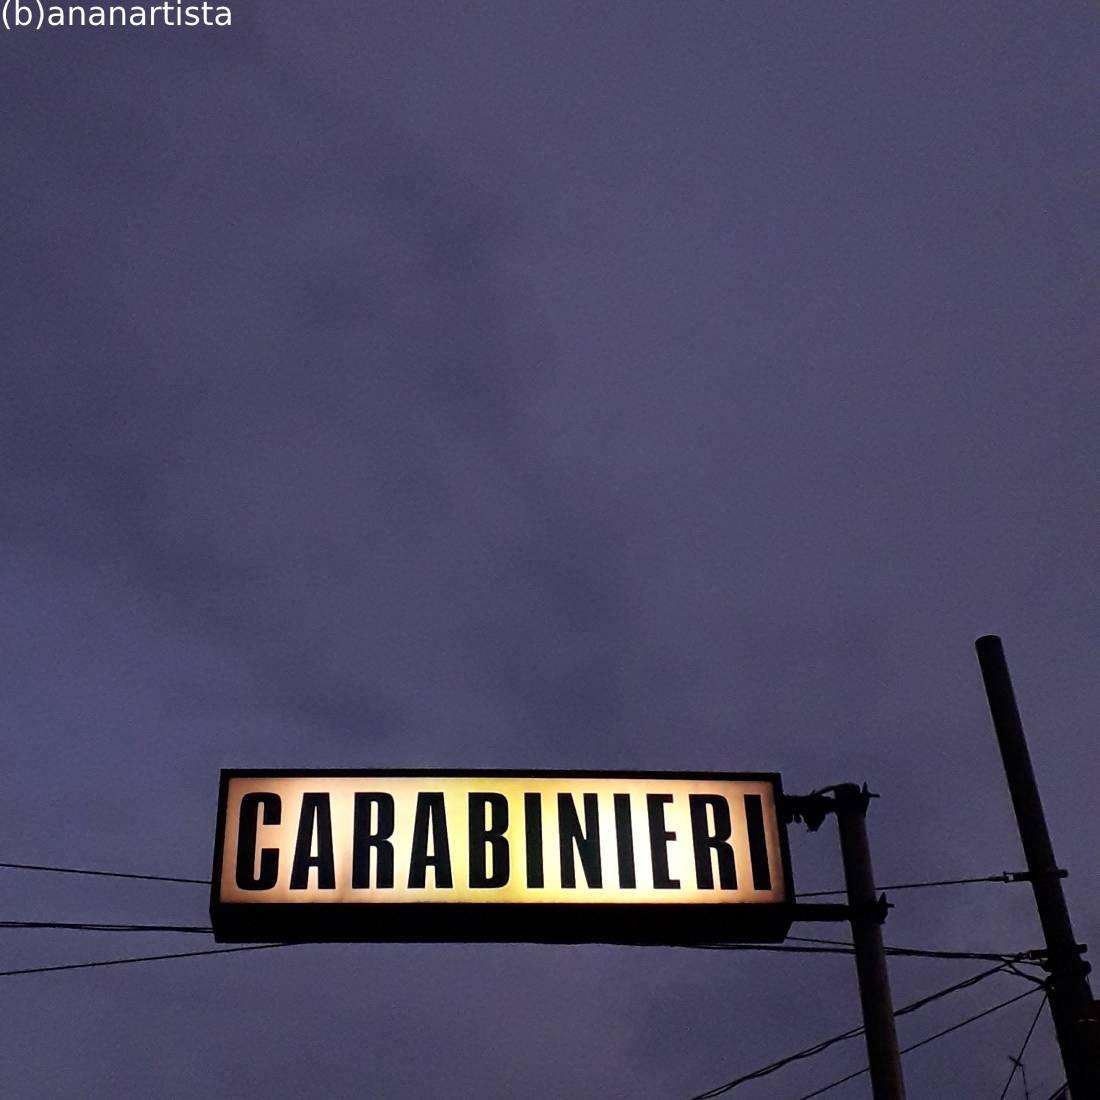 carabinieri : fotografia di (b)ananartista sbuff